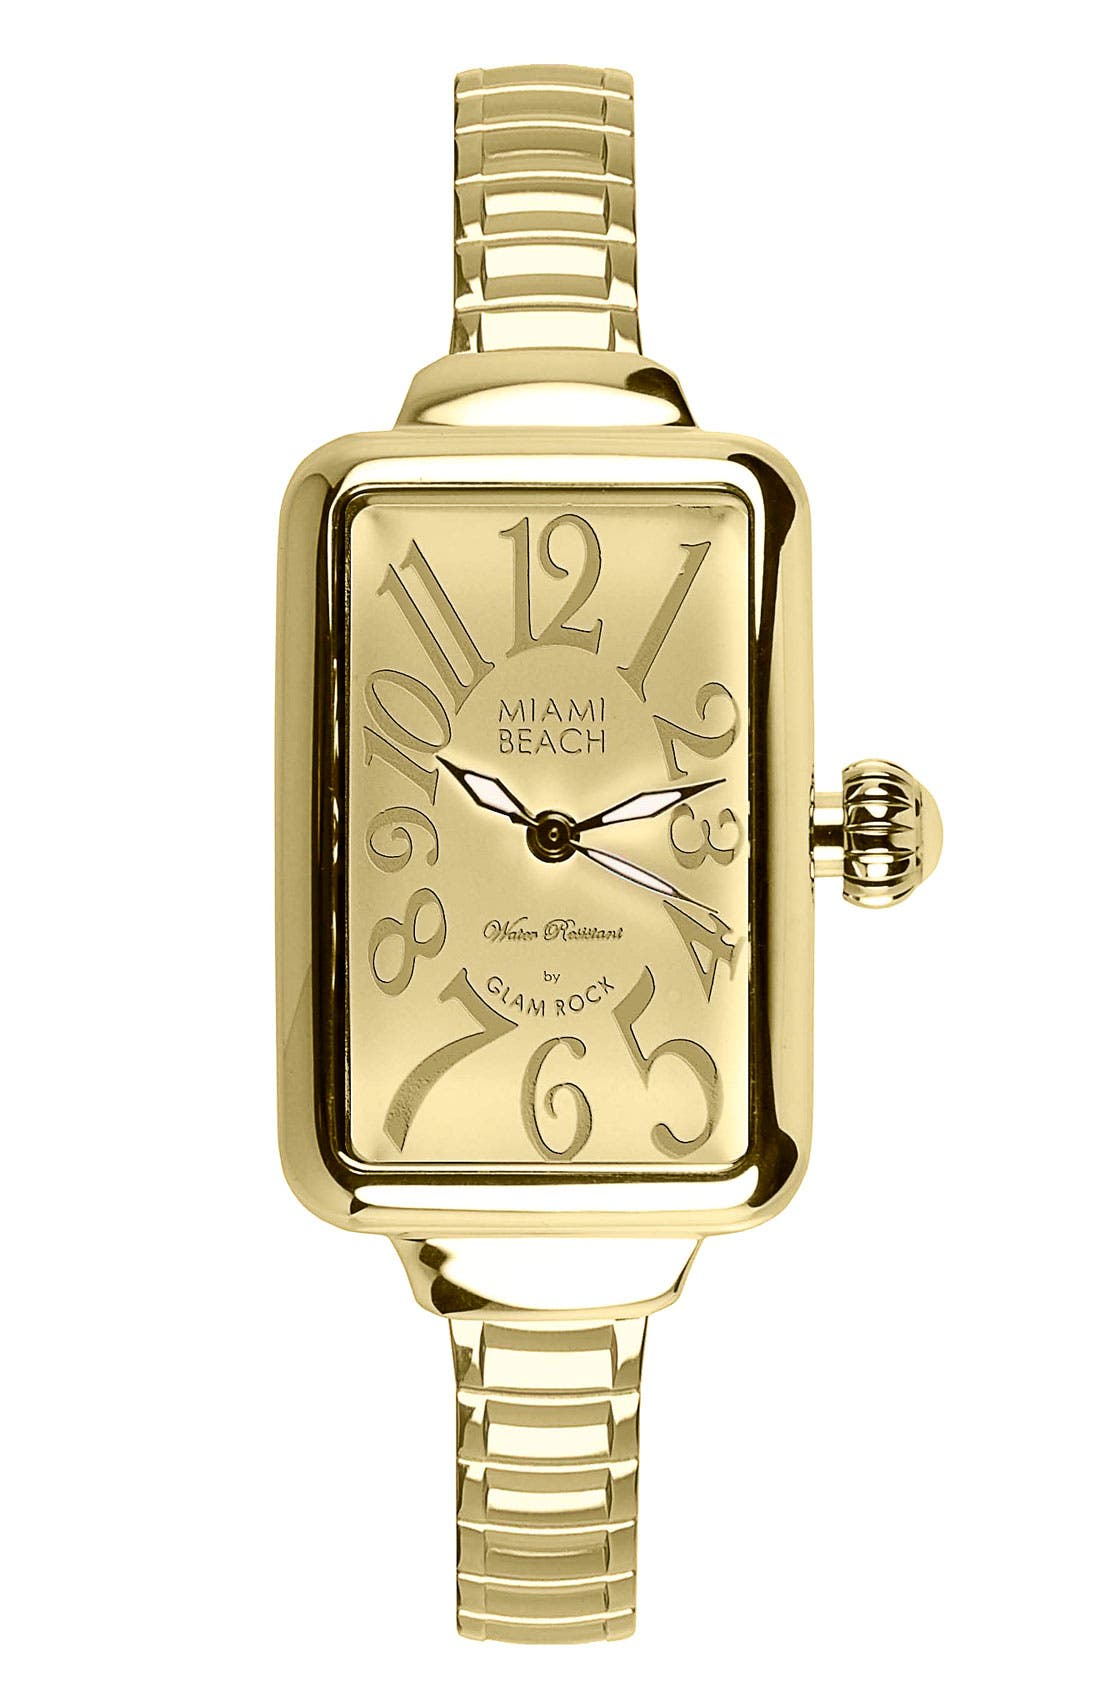 Main Image - Miami Beach by Glam Rock Rectangular Expansion Bracelet Watch